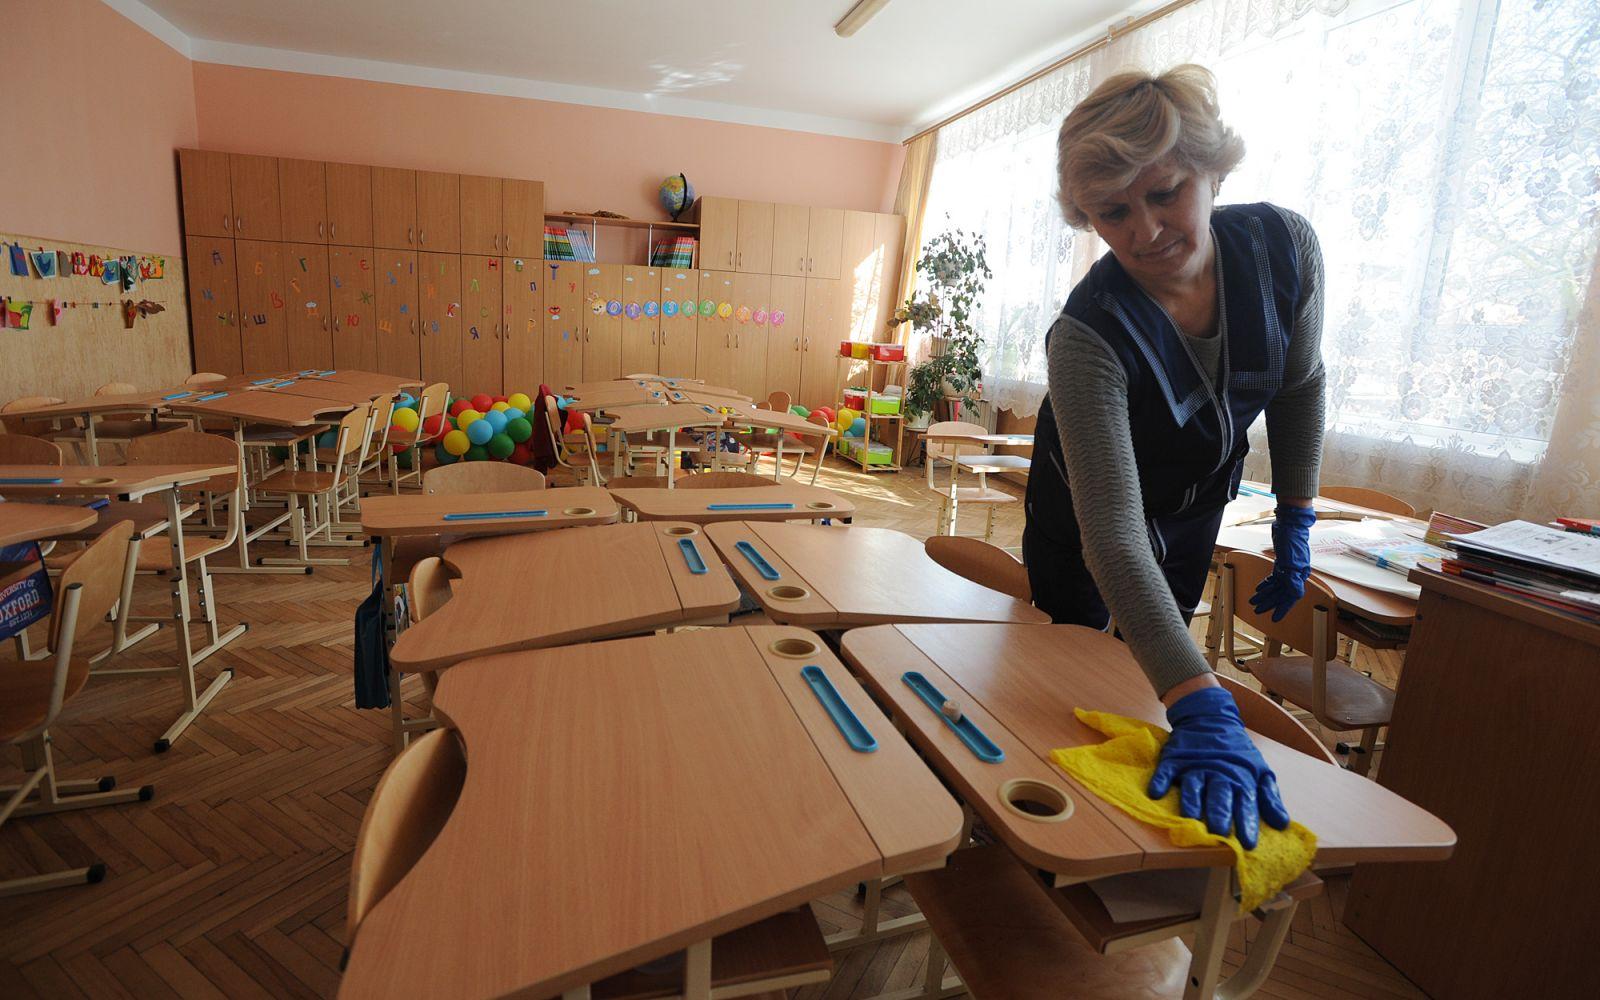 В Киеве закрыли школу на карантин из-за COVID-19 у педагогов